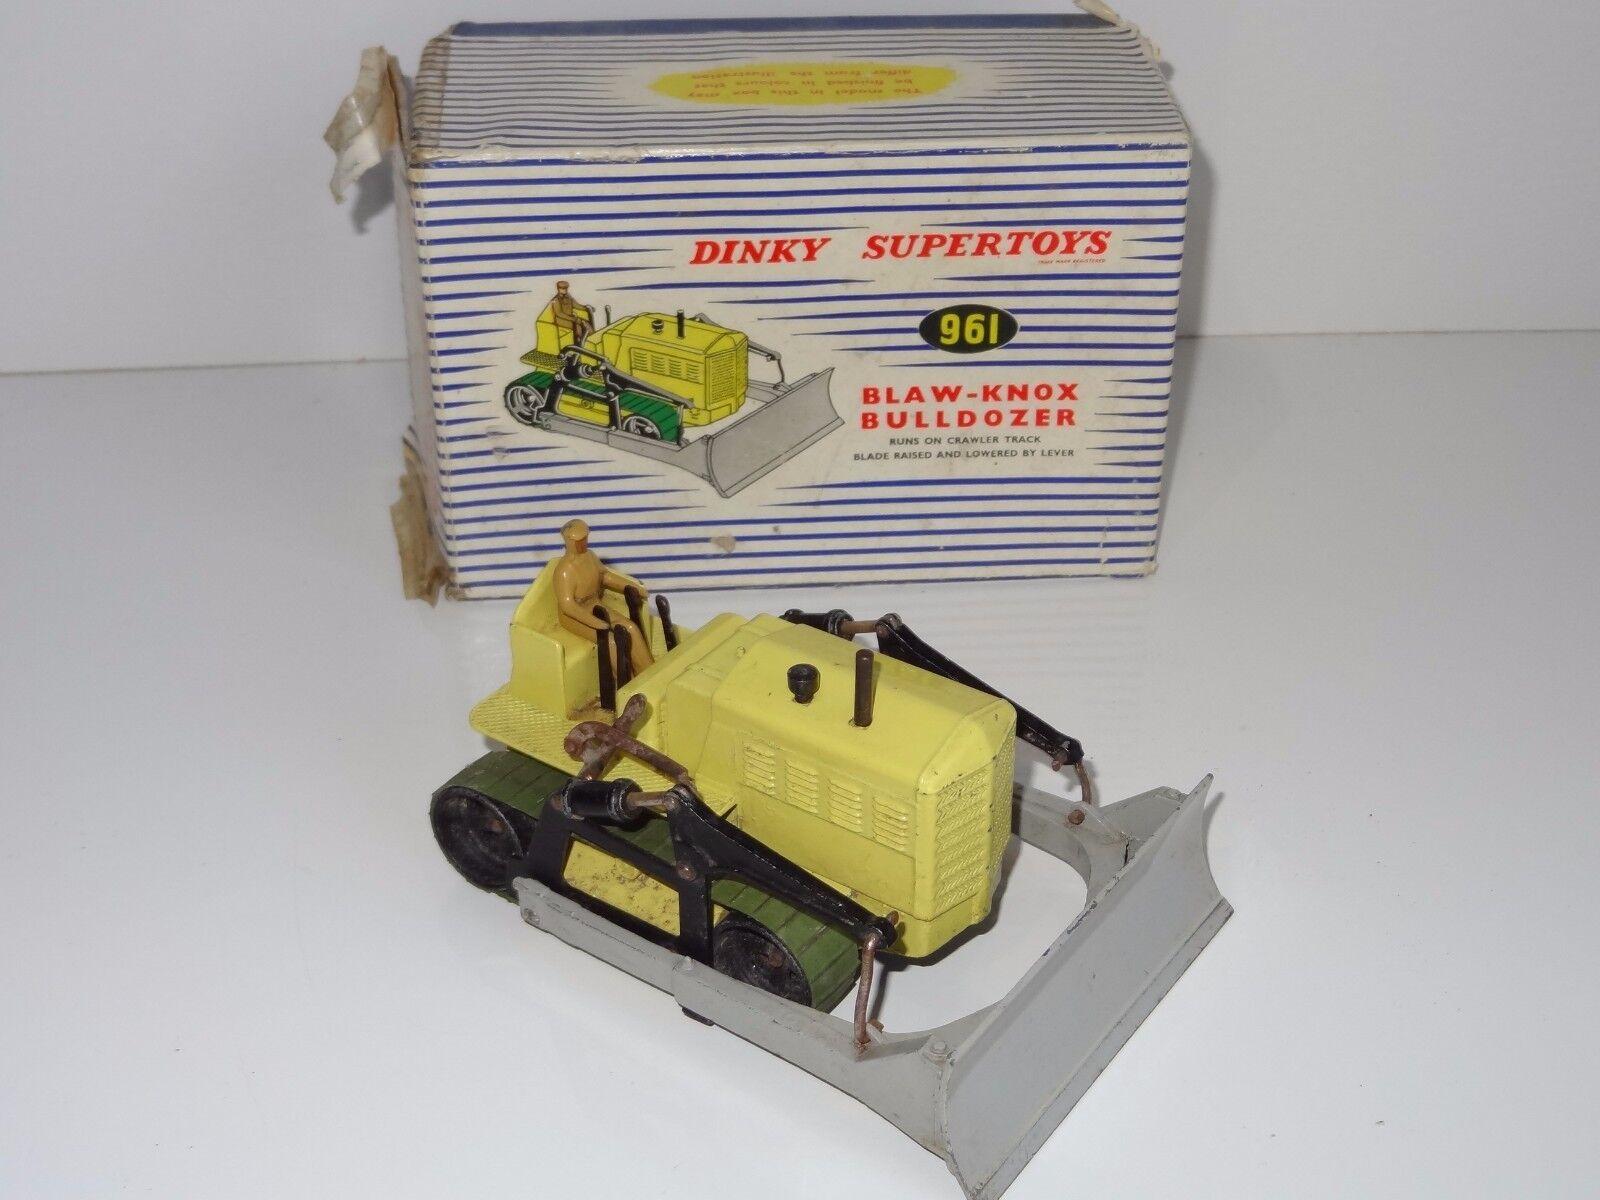 costo real (W) Dinky blaw knox bulldozer - 961 961 961  para barato